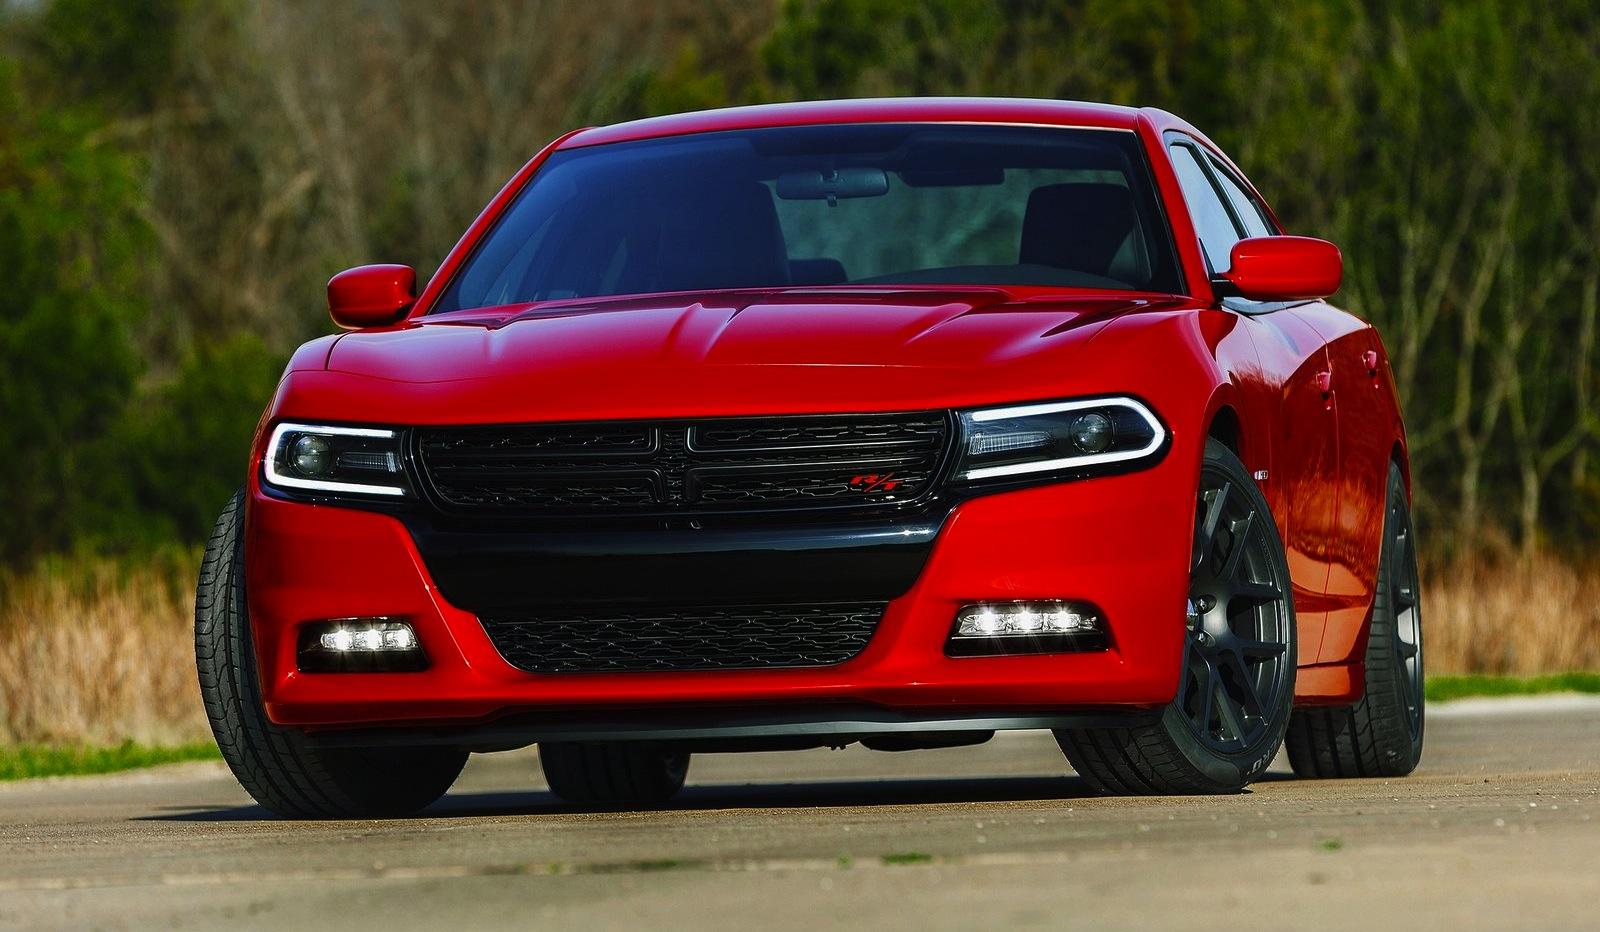 2020 Dodge Avenger Srt Release Date and Concept